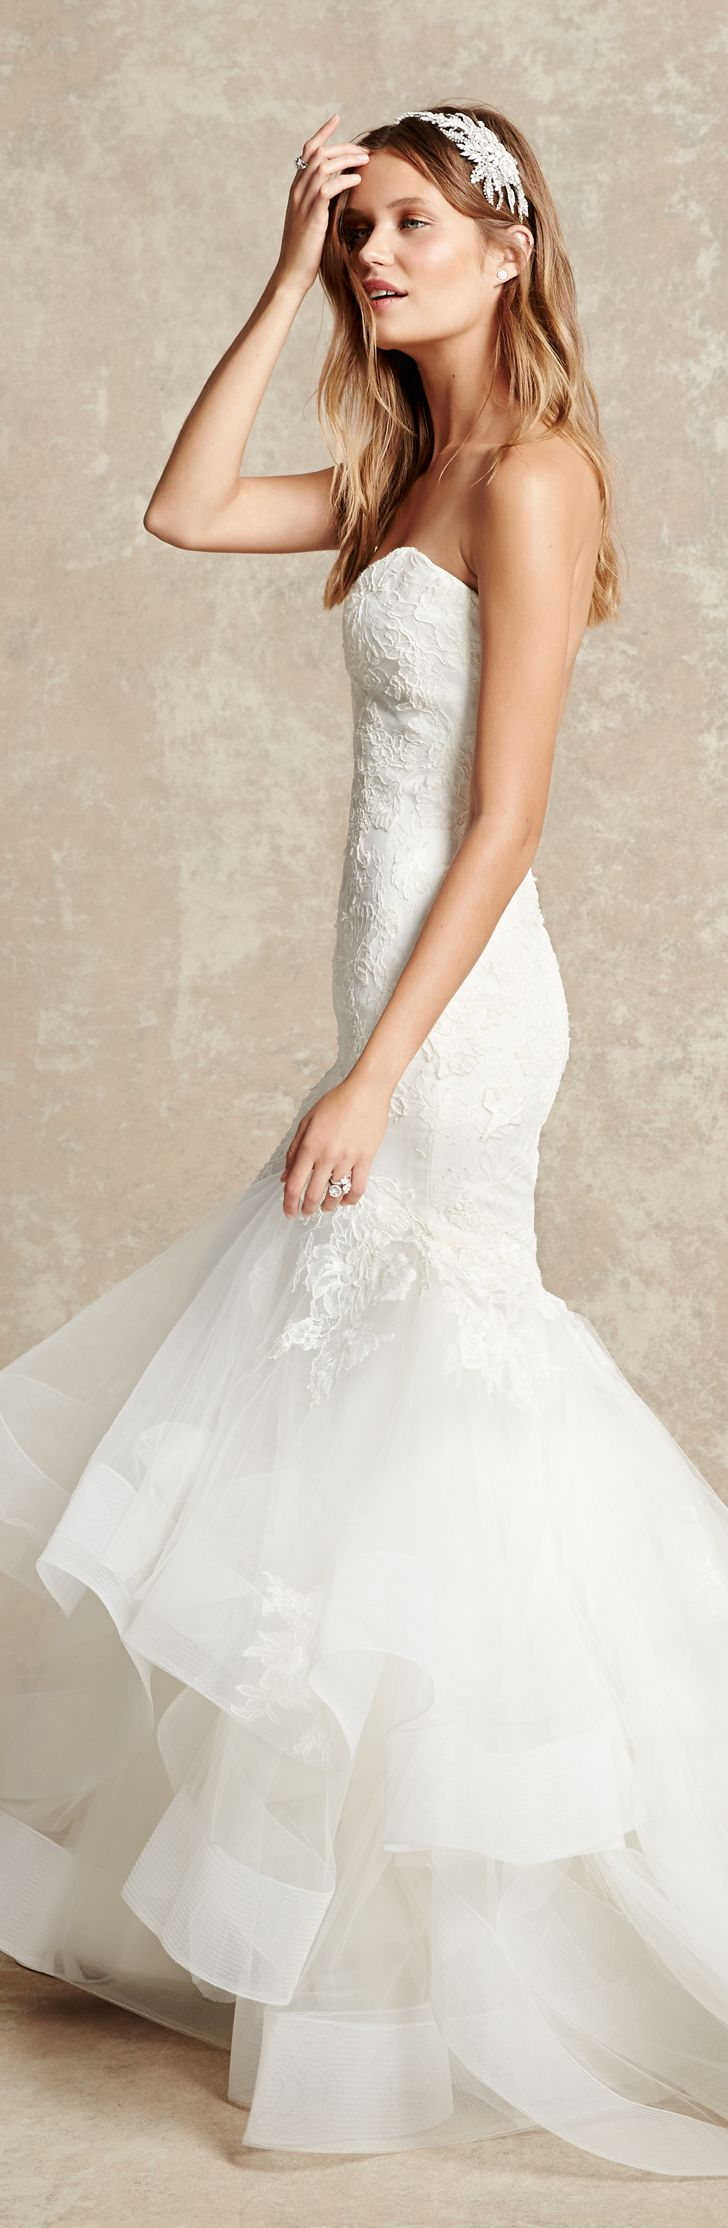 10 best Bliss Fall 2017 images on Pinterest   Wedding gowns, Short ...